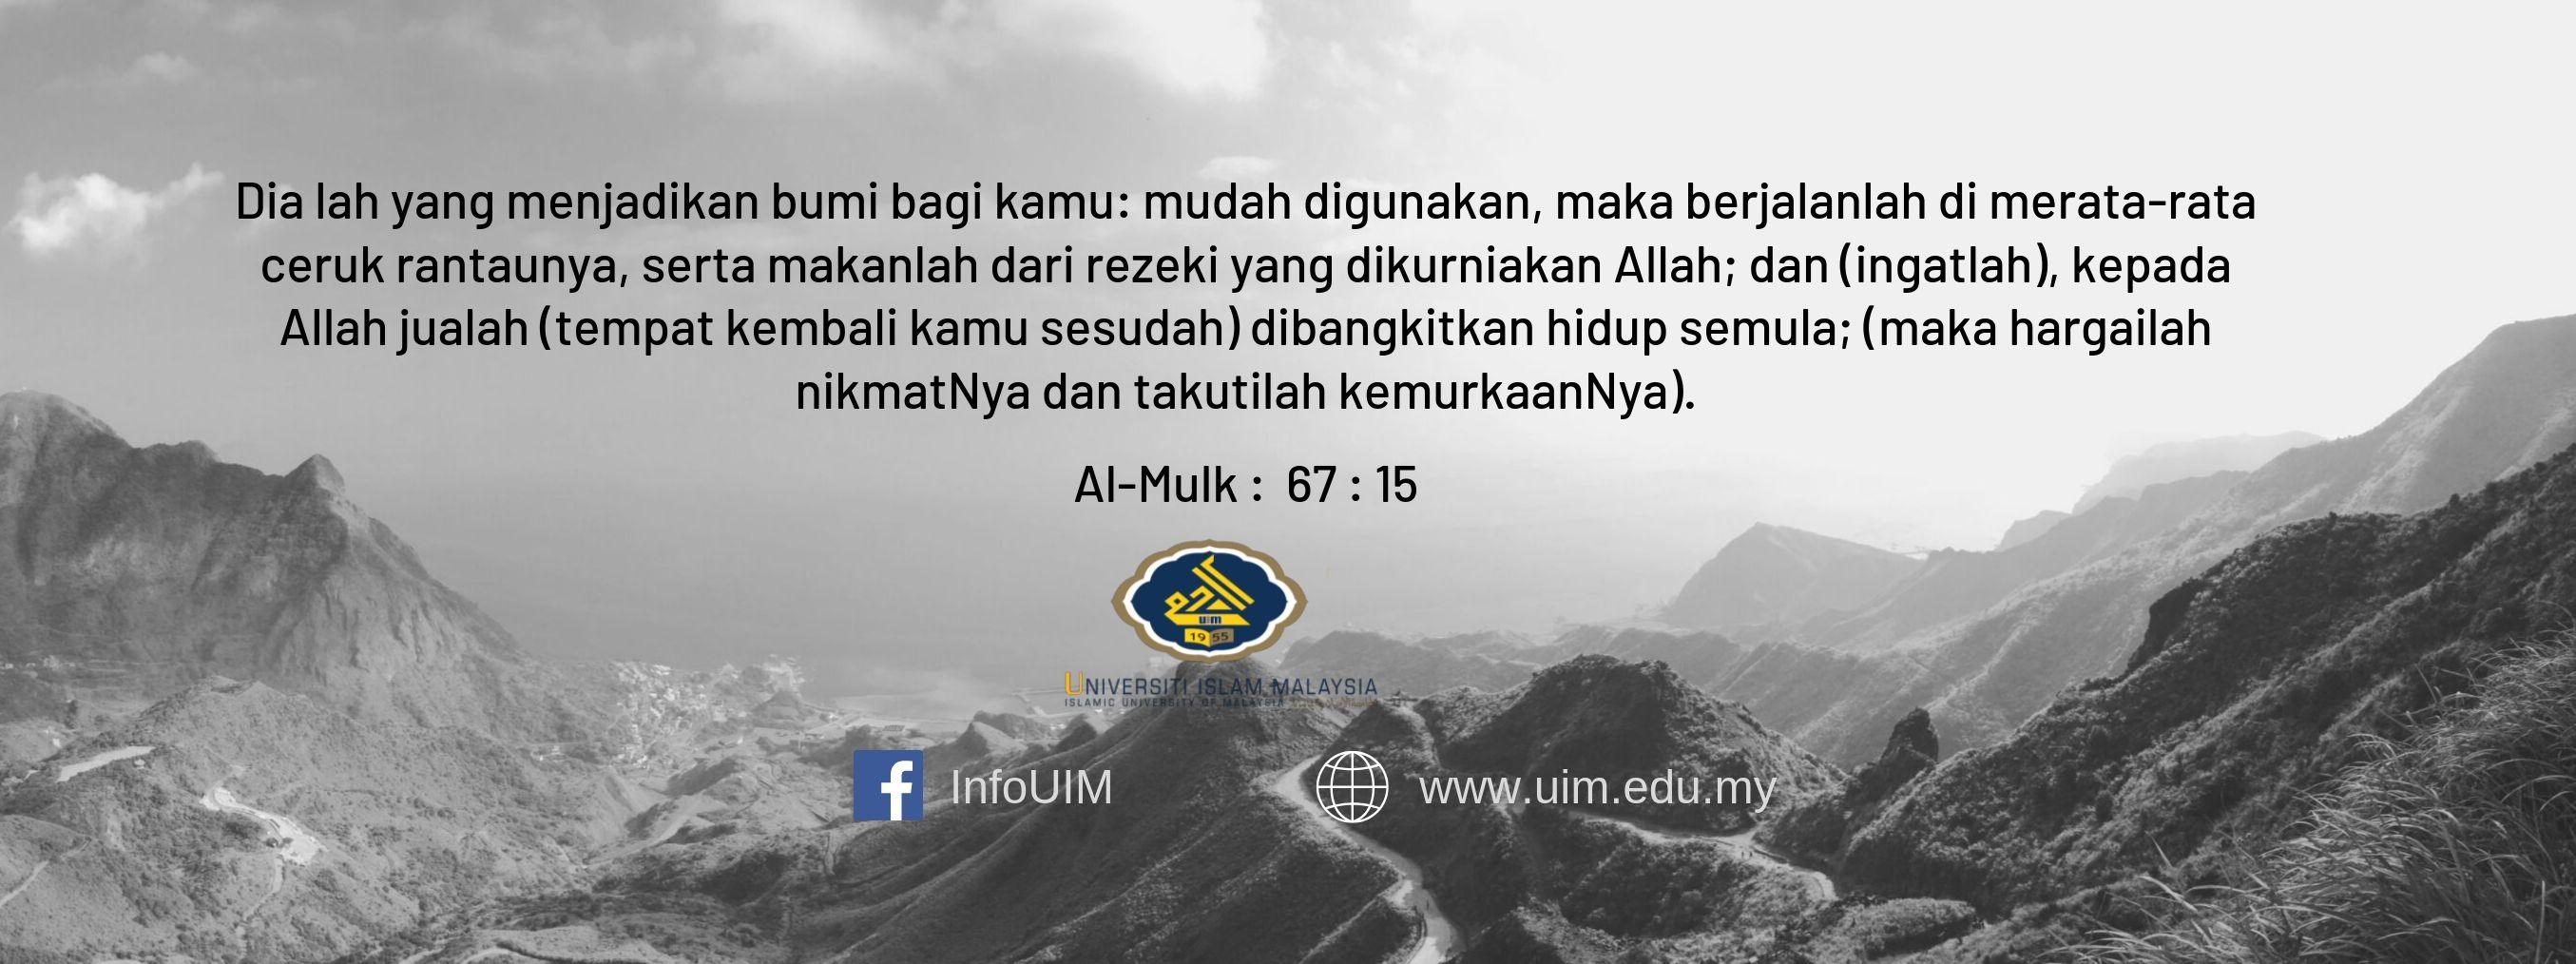 al_mulk1 Job Application Form In Malay on part time, free generic, blank generic,